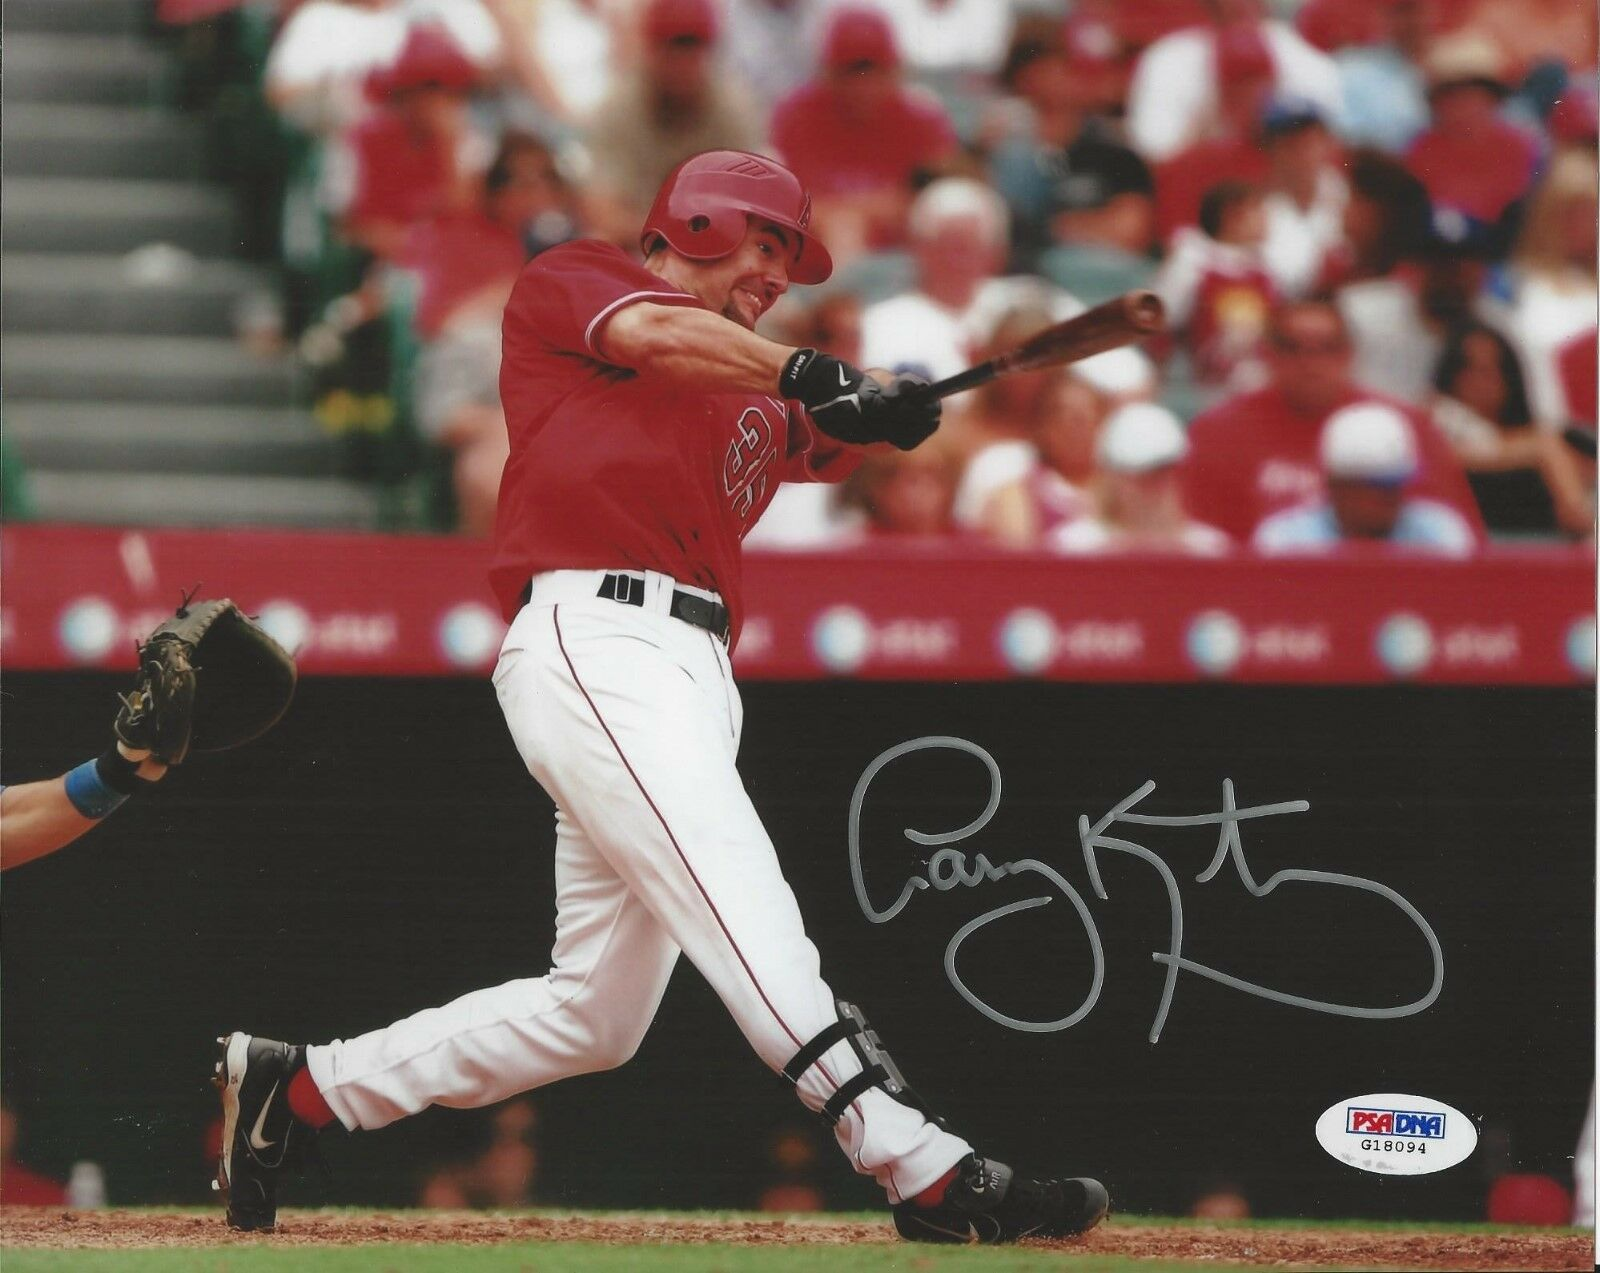 Casey Kotchman Los Angeles Angels signed 8x10 photo PSA/DNA # G18094